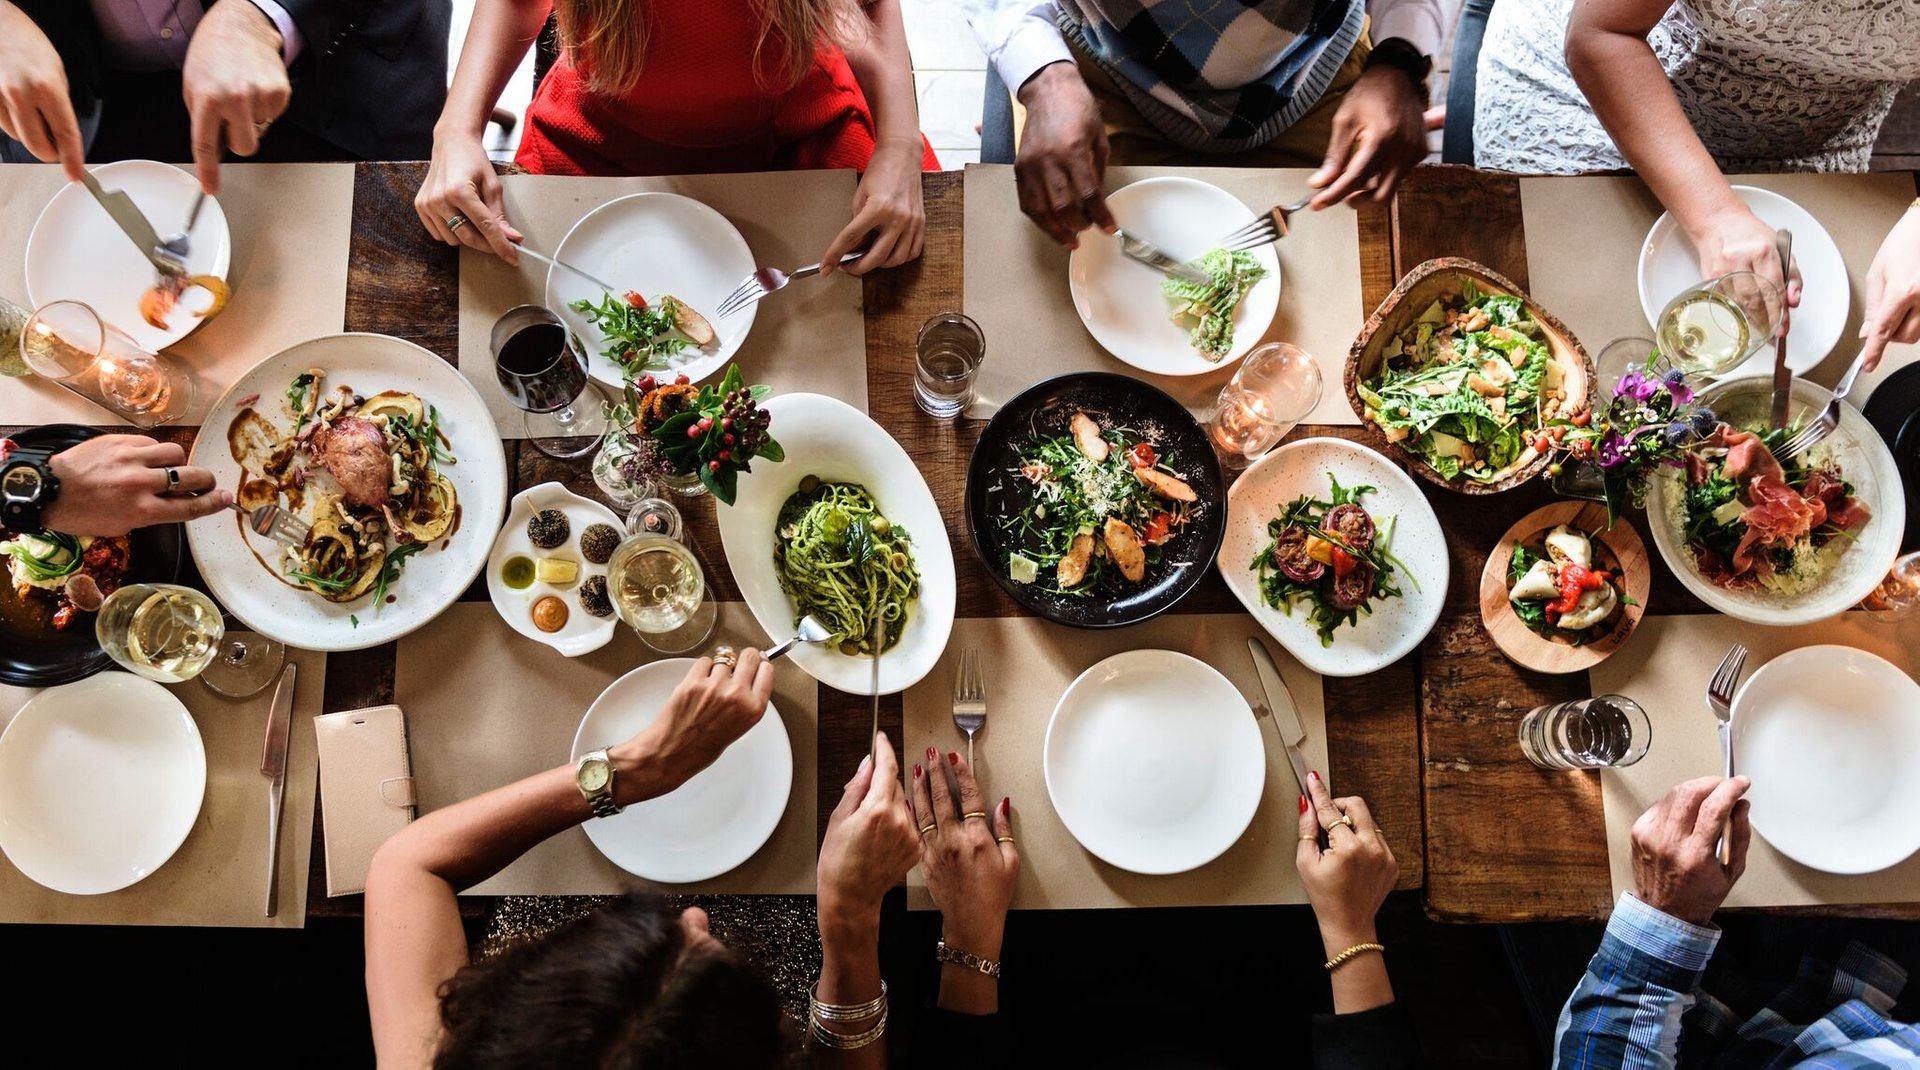 San Diego Restaurant Week in San Diego - Best Season 2020